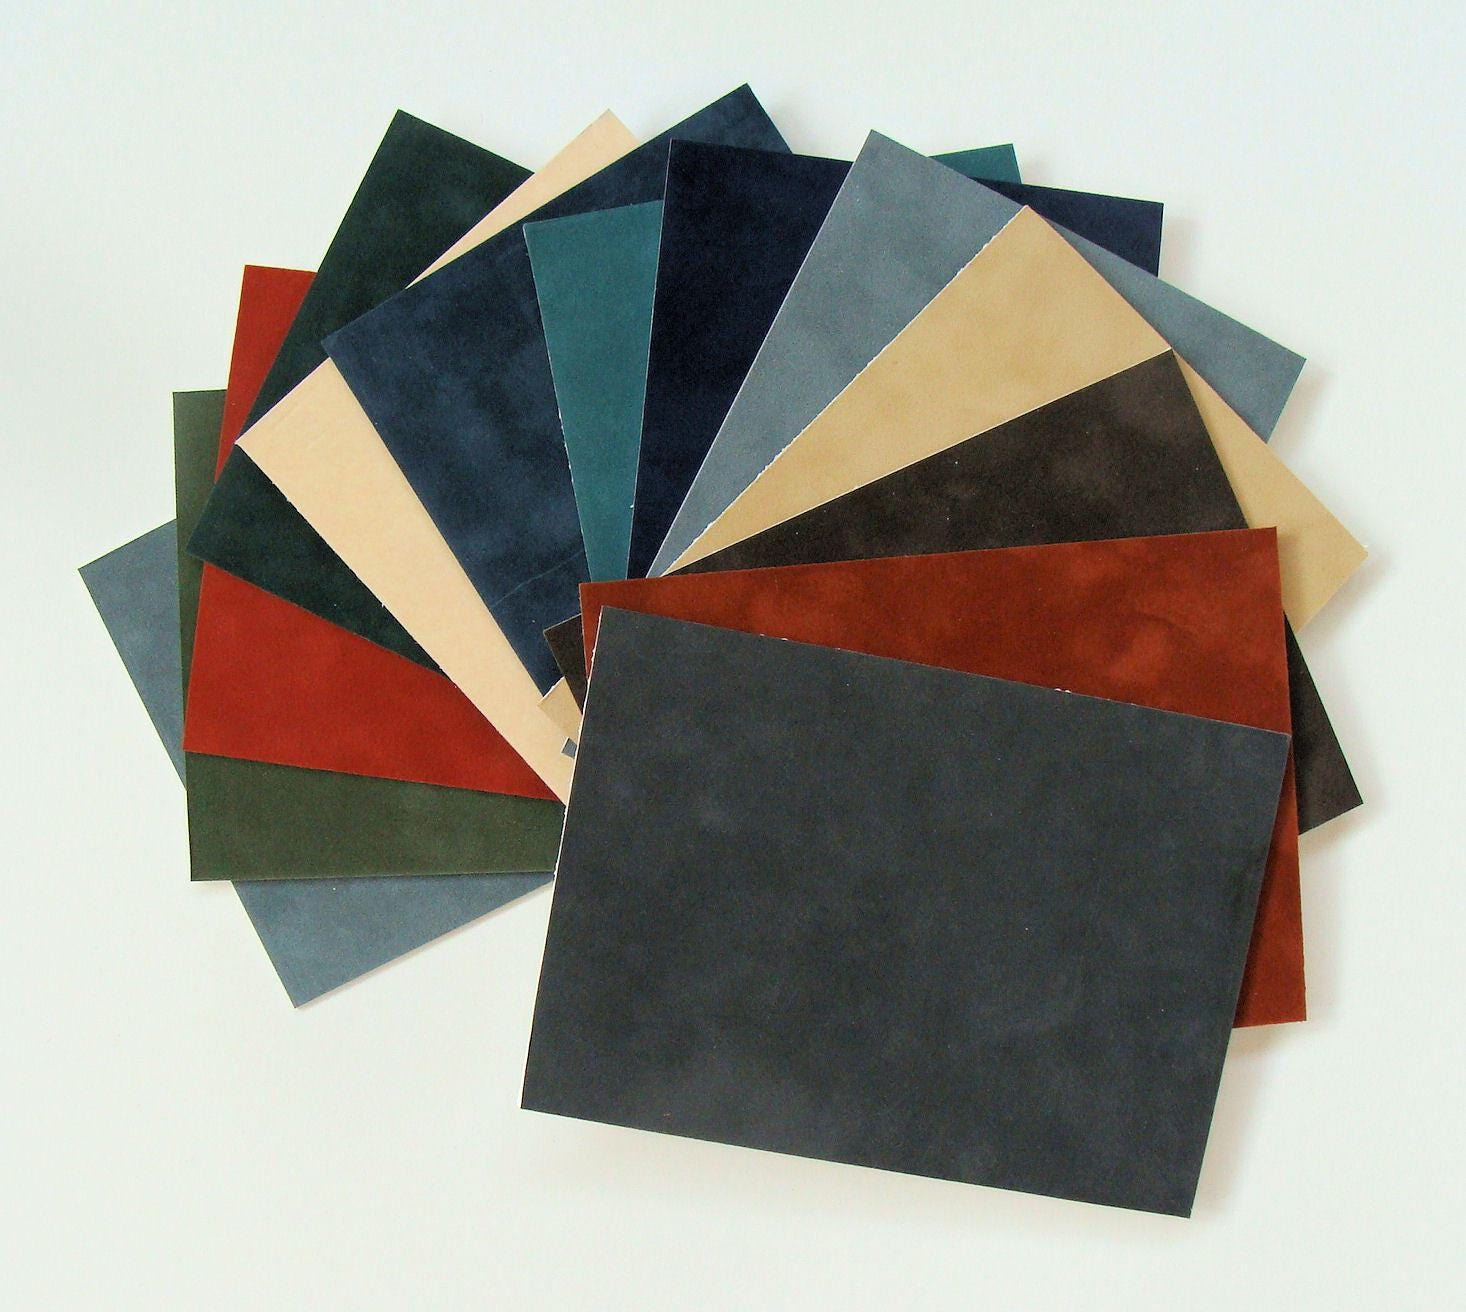 board x bainbridge mat mats birmingham moulding dove al productshowroom international